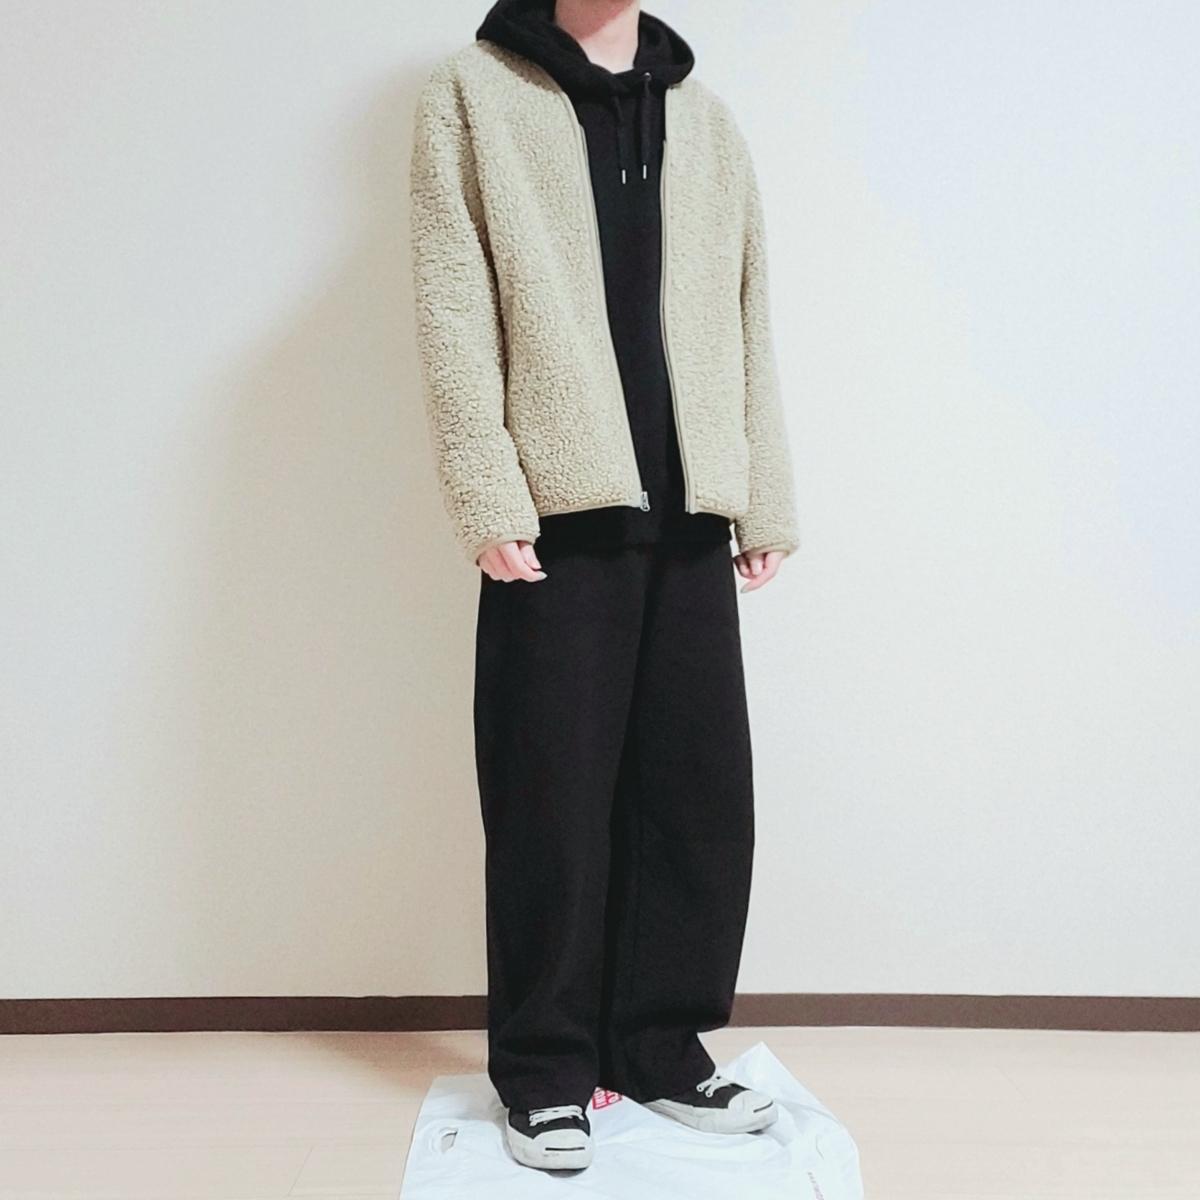 f:id:hihowru:20191215140752j:plain